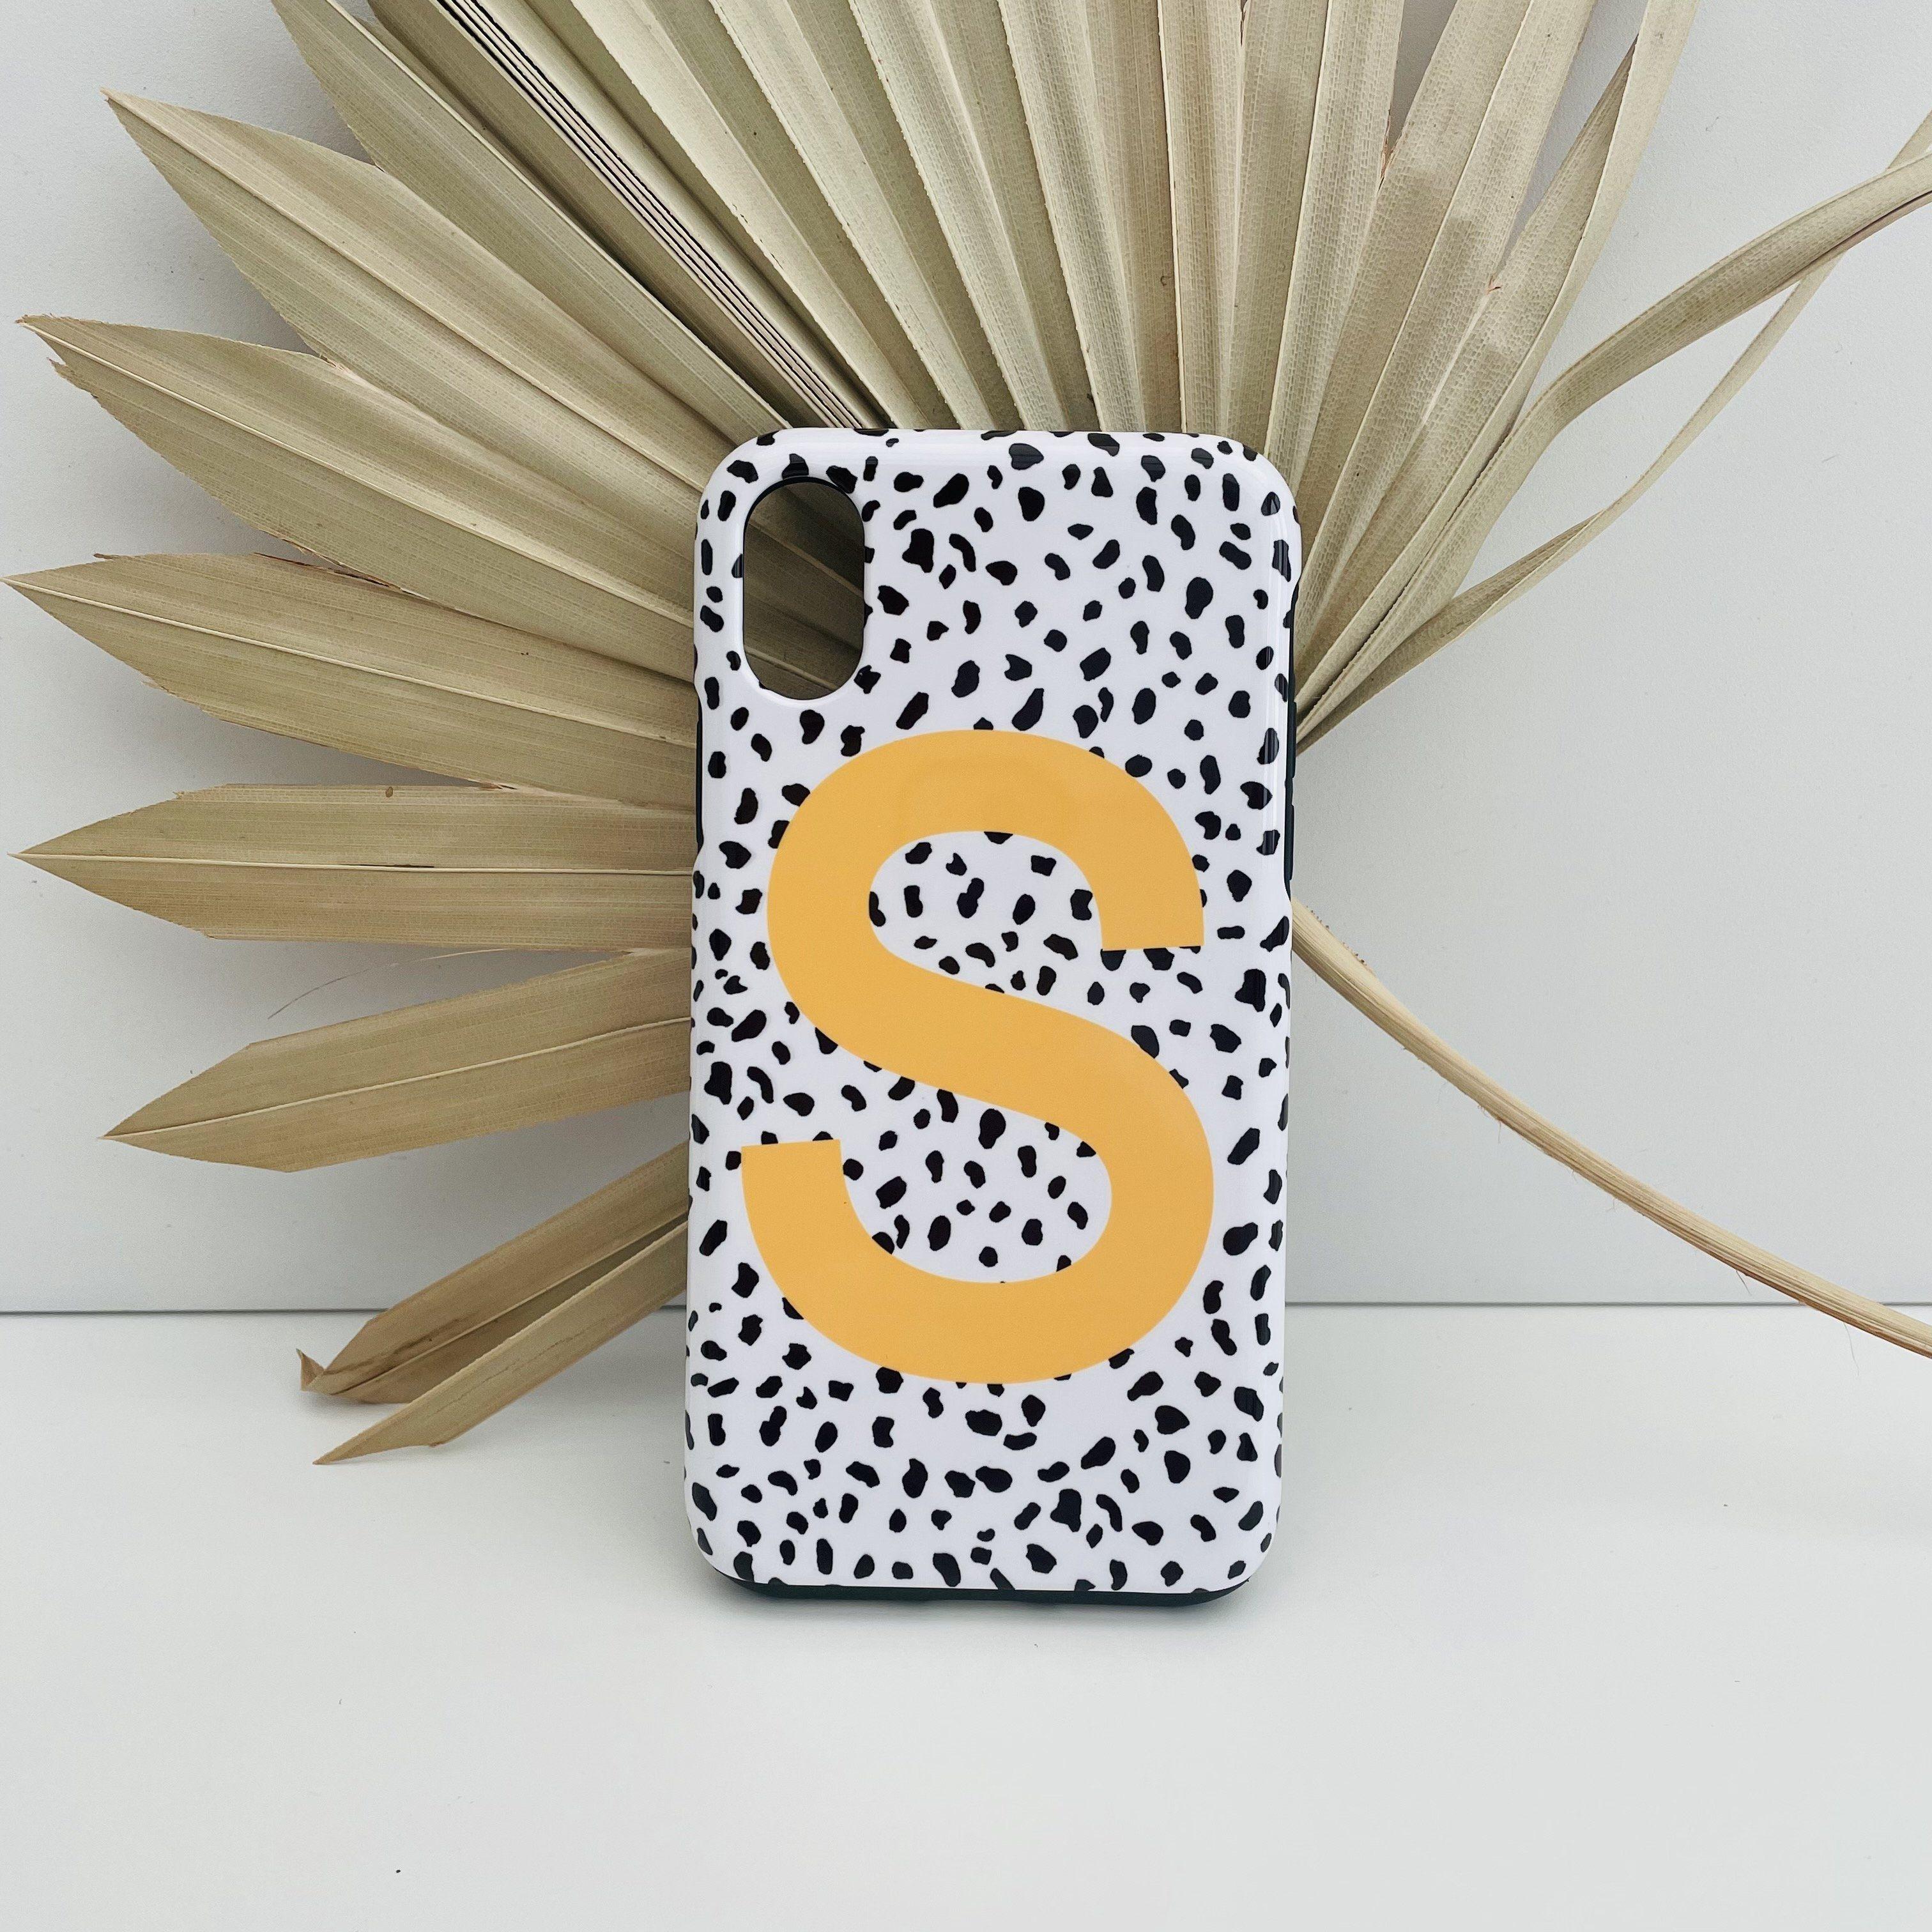 SAMPLE SALE : Mustard Dalmatian Print Letter 'S' iPhone X/XS Deluxe Tough Case